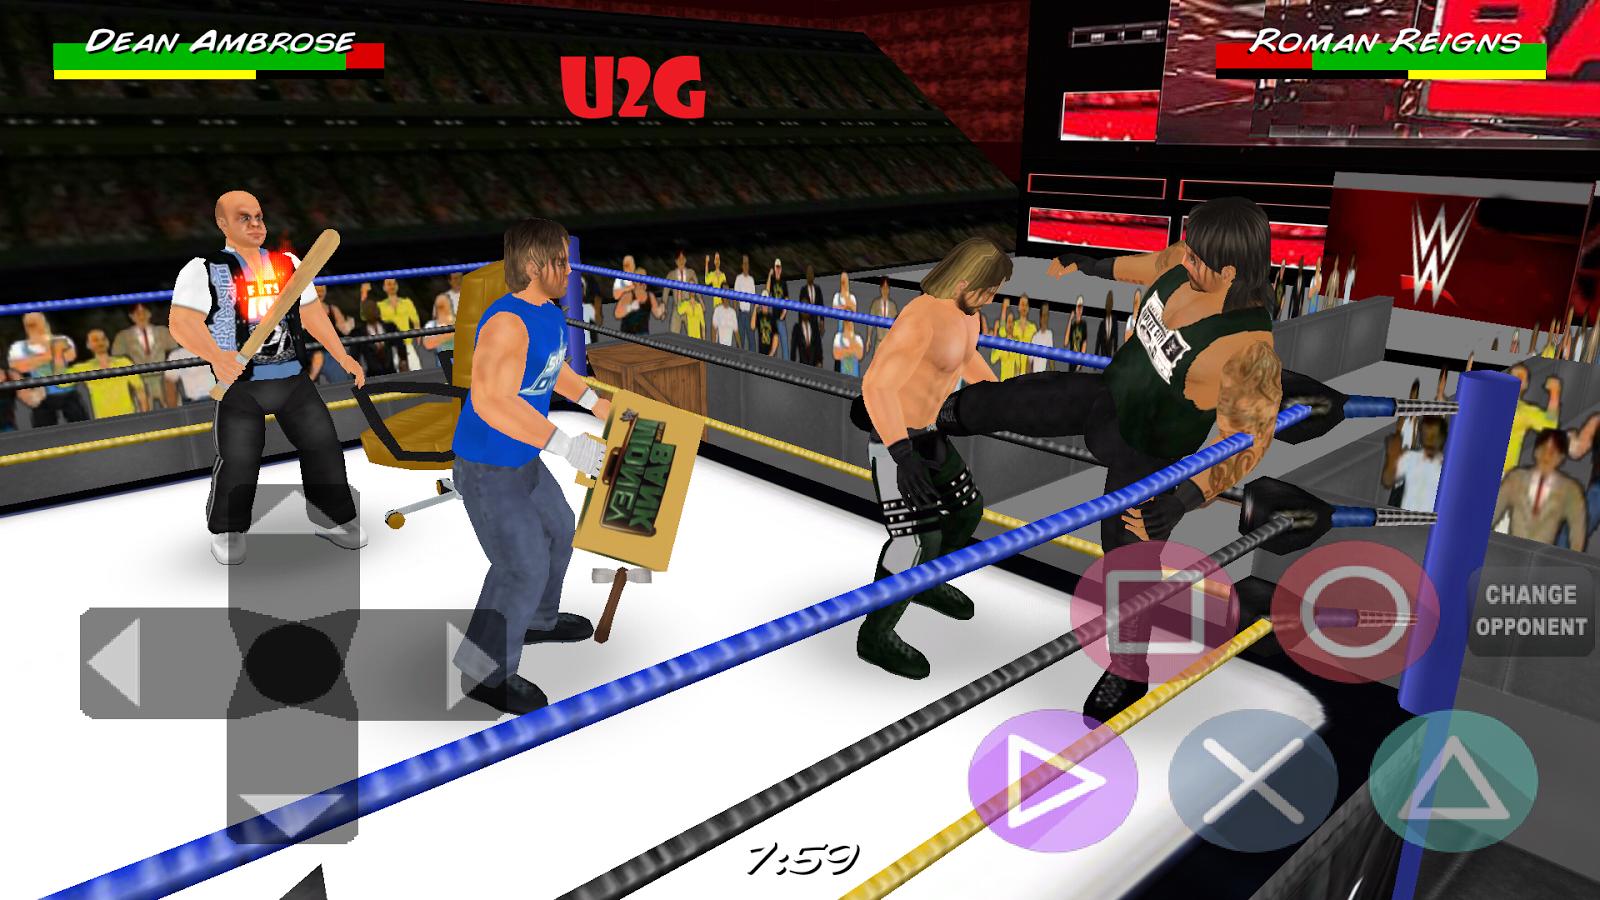 Wrestling Revolution D Exhibition Title Match : Wrestling revolution d wwe k mod mediafire download